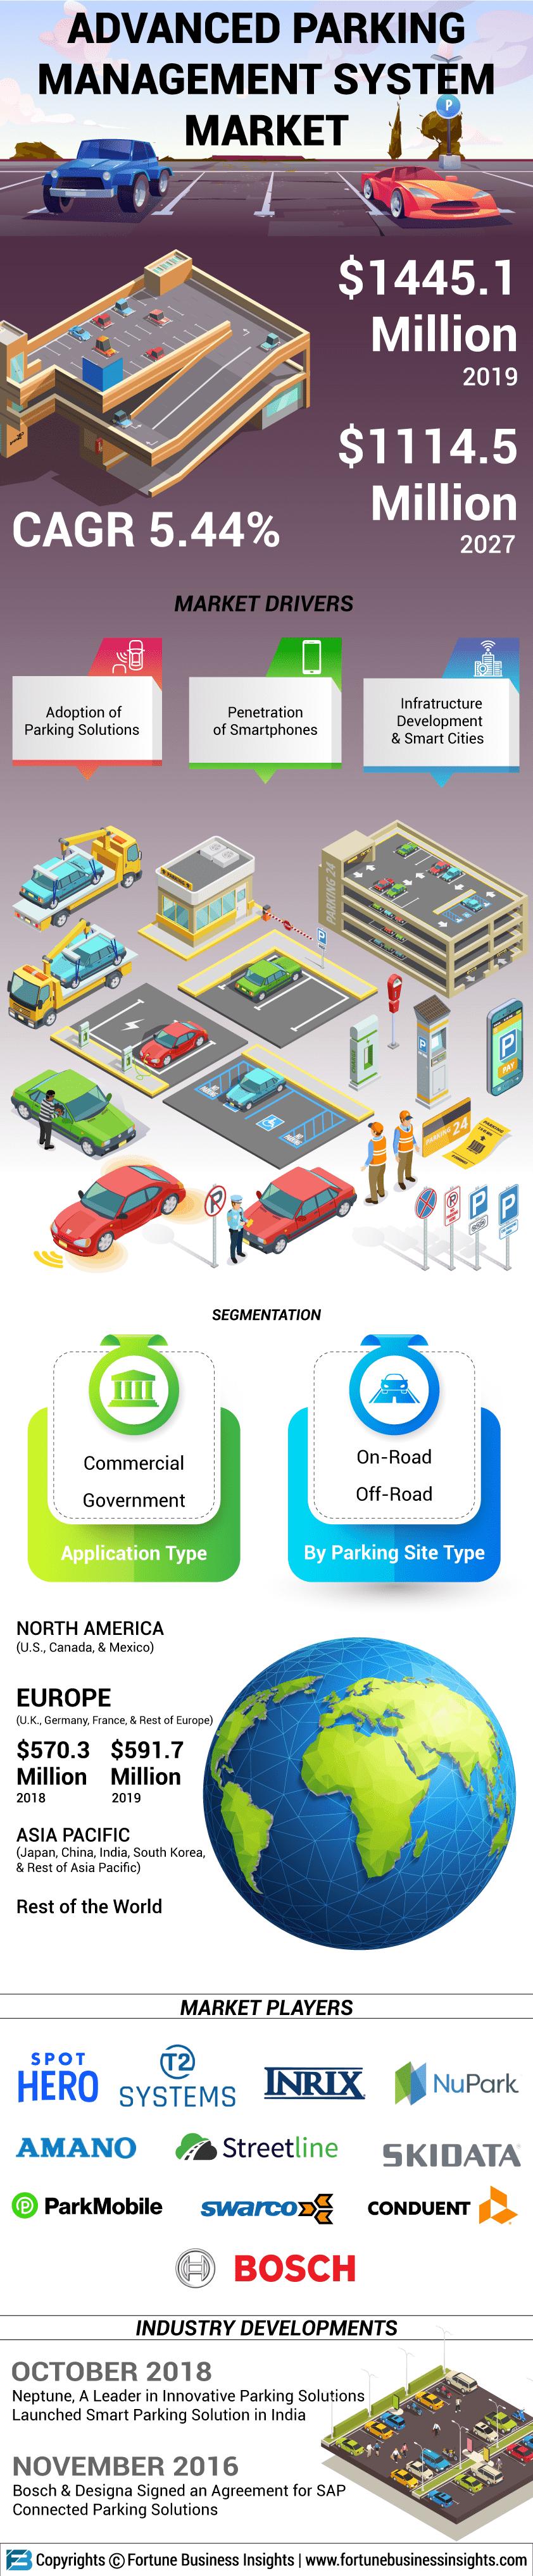 Advanced Parking Management System Market